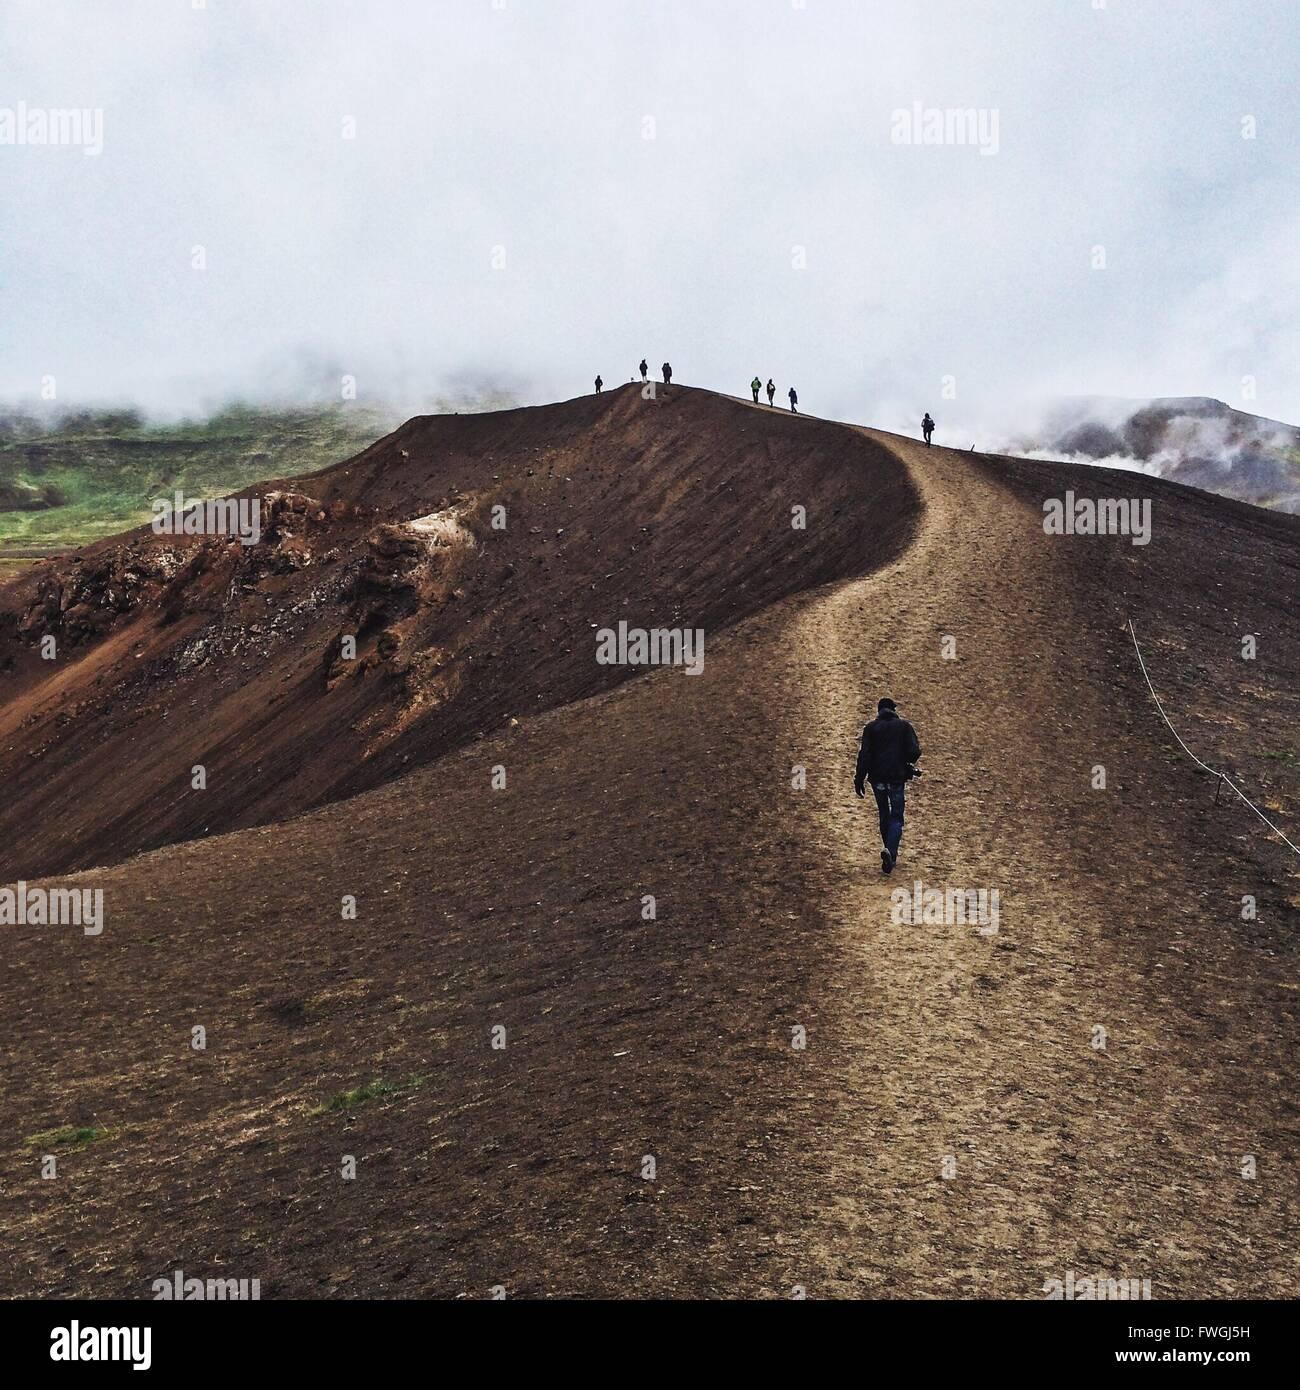 Menschen wandern in den Bergen bei nebligen Wetter Stockbild